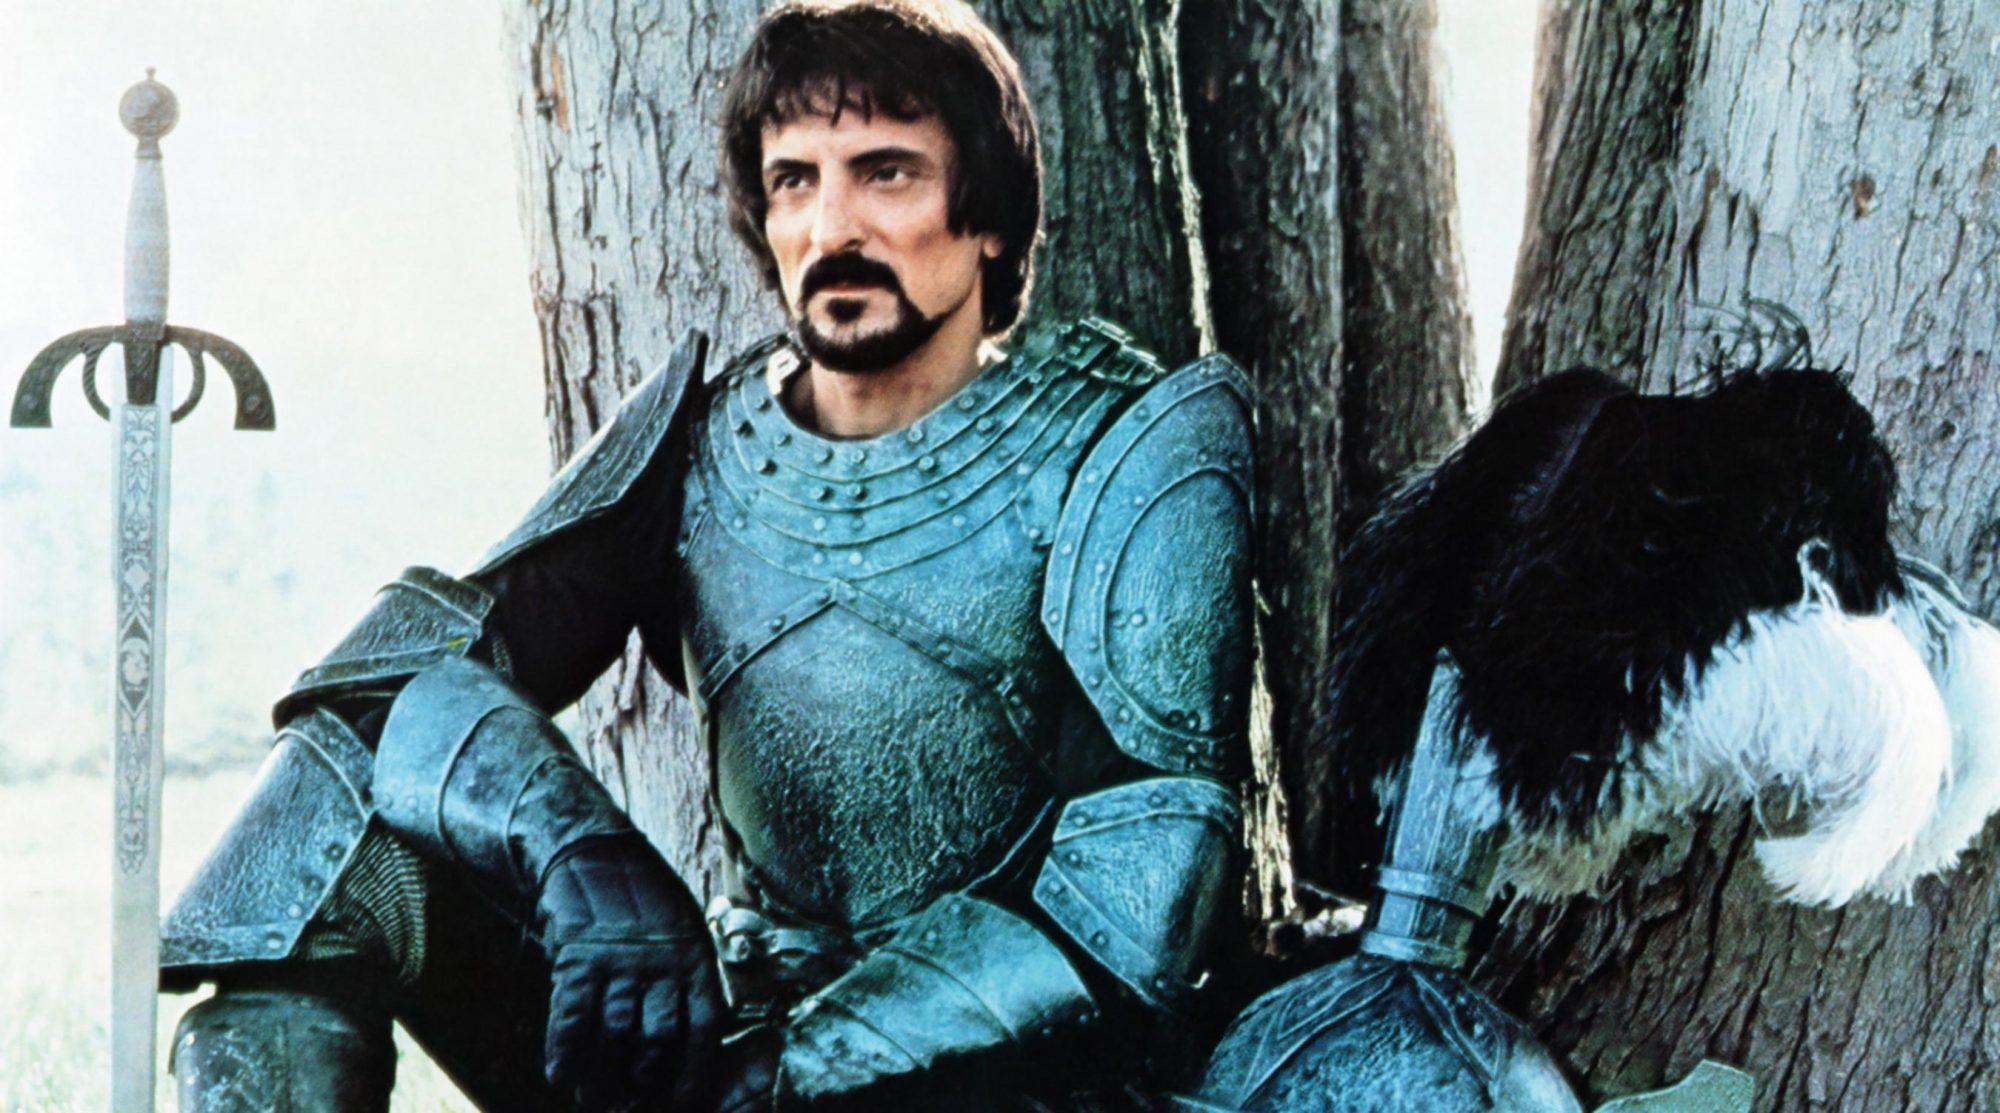 KNIGHTRIDERS, Tom Savini, 1981, © United Film Distribution/courtesy Everett Collection